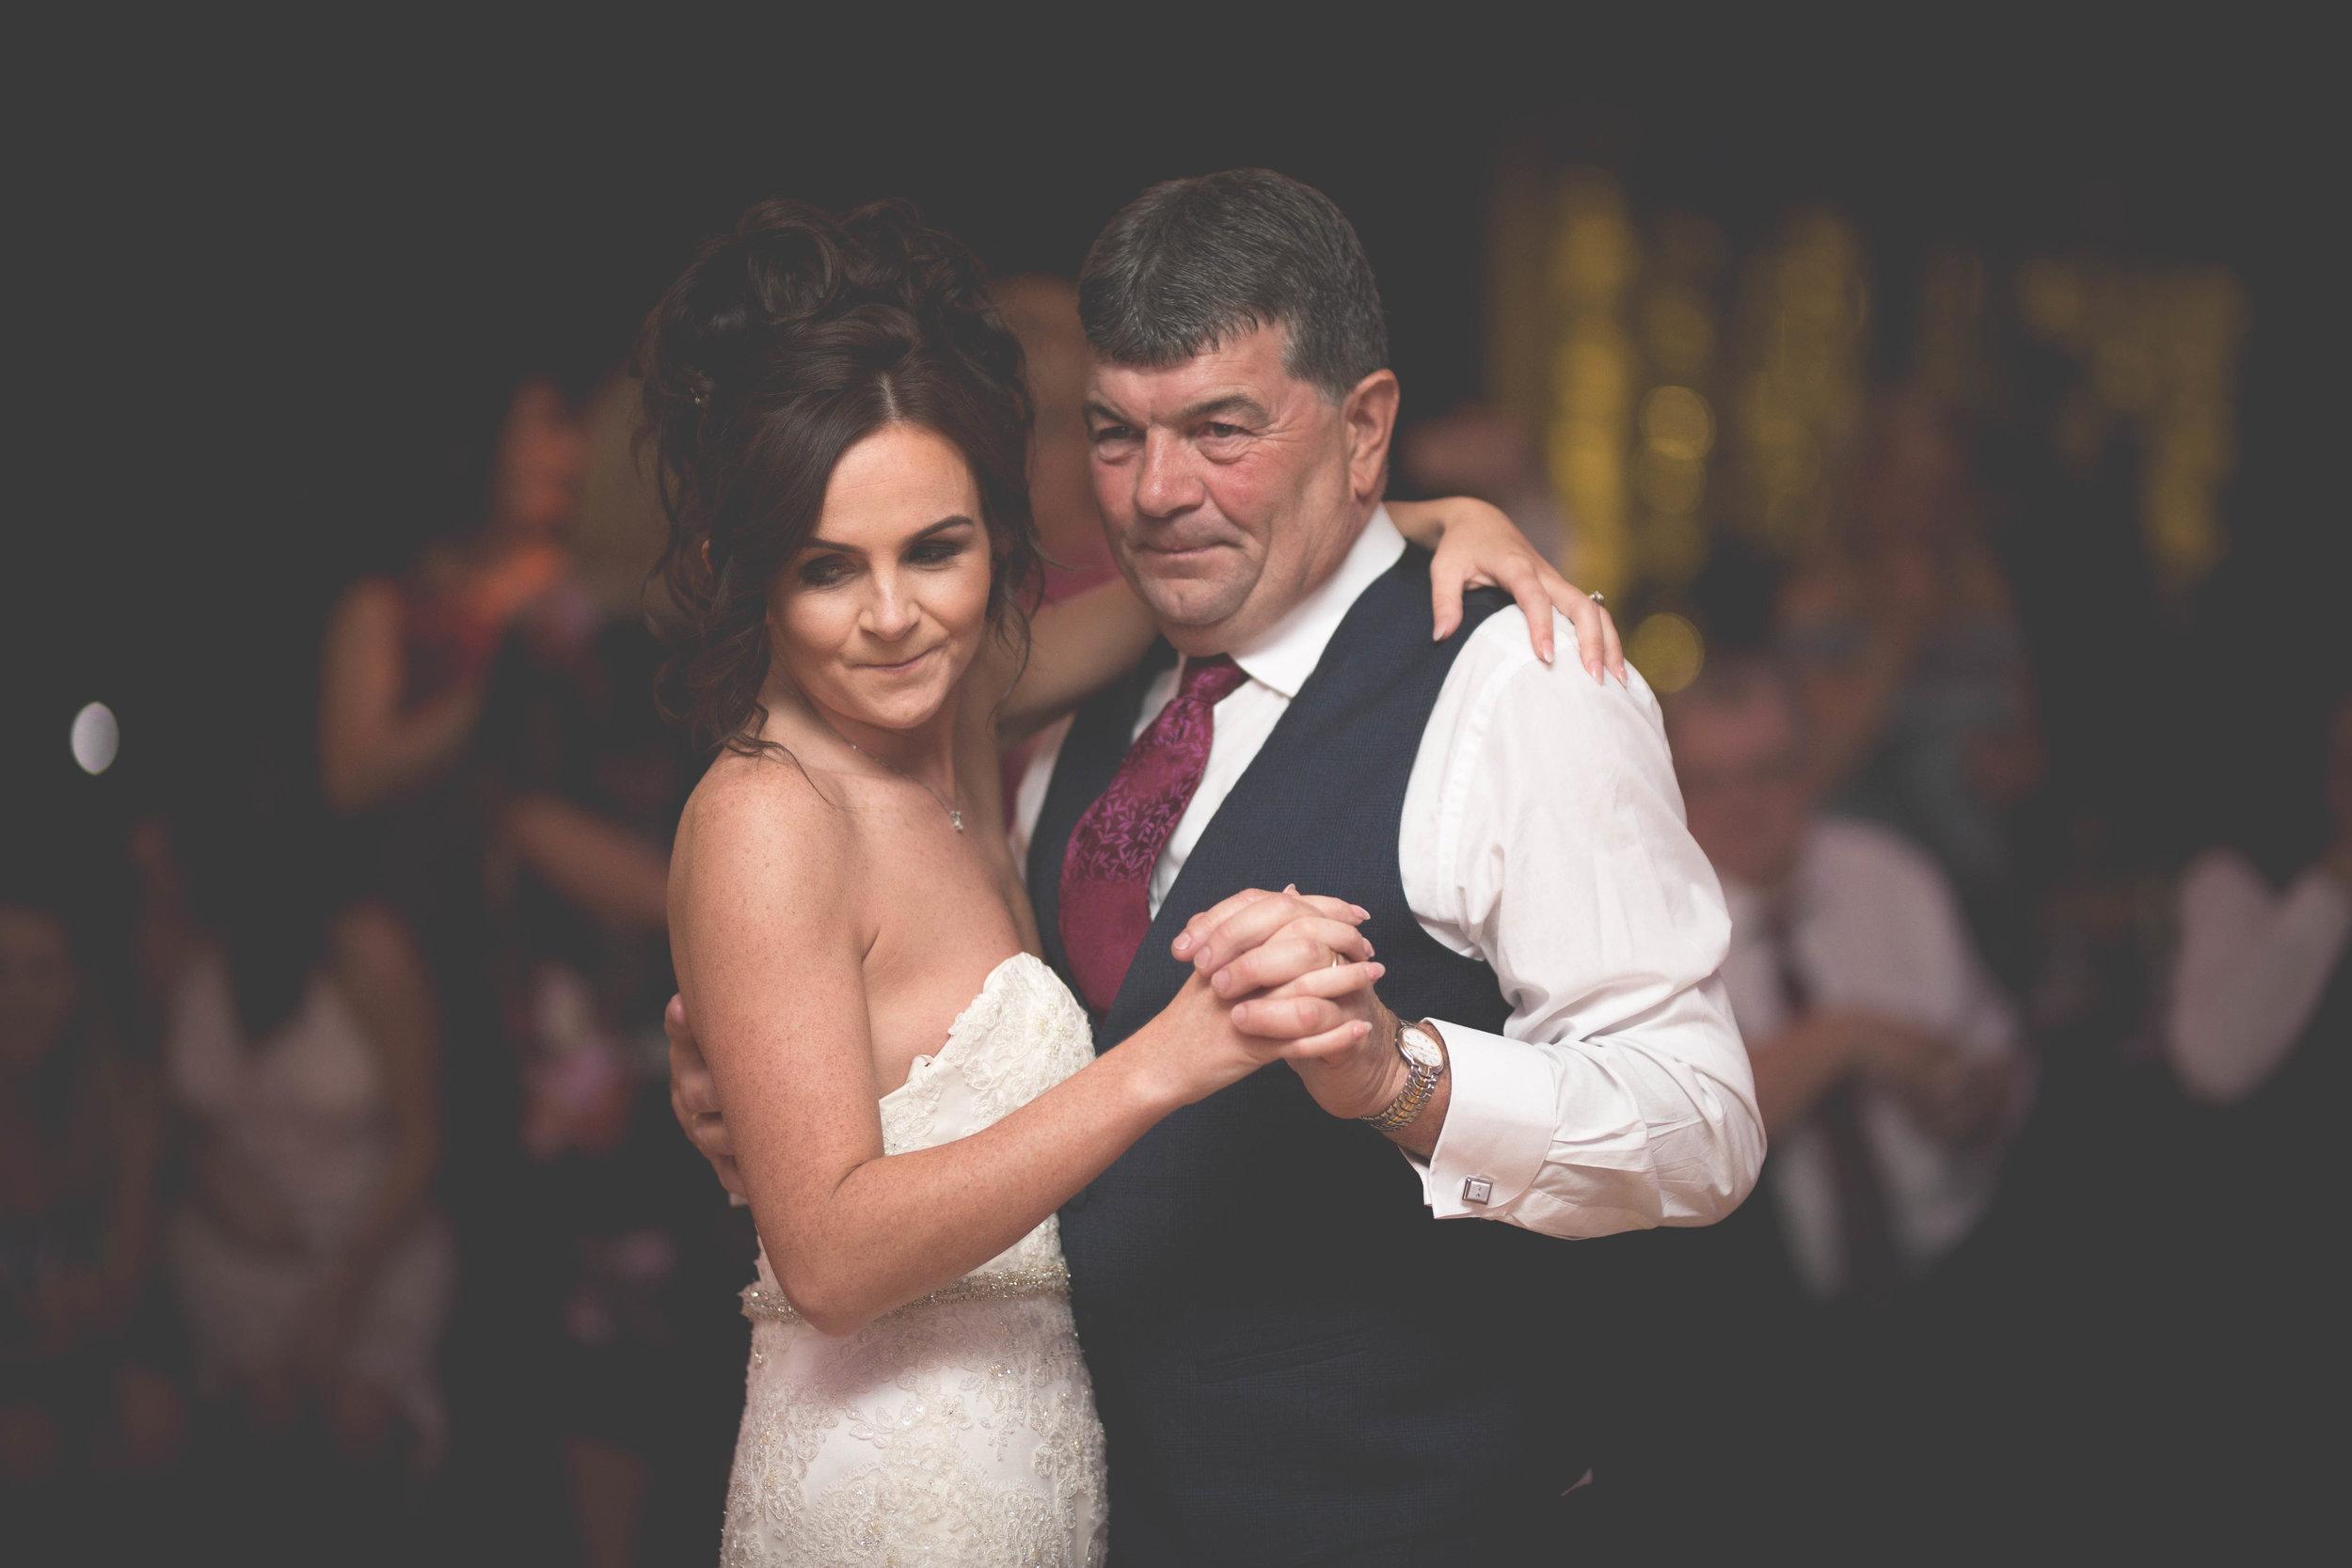 Aisling & Andy - First Dance-34.jpg